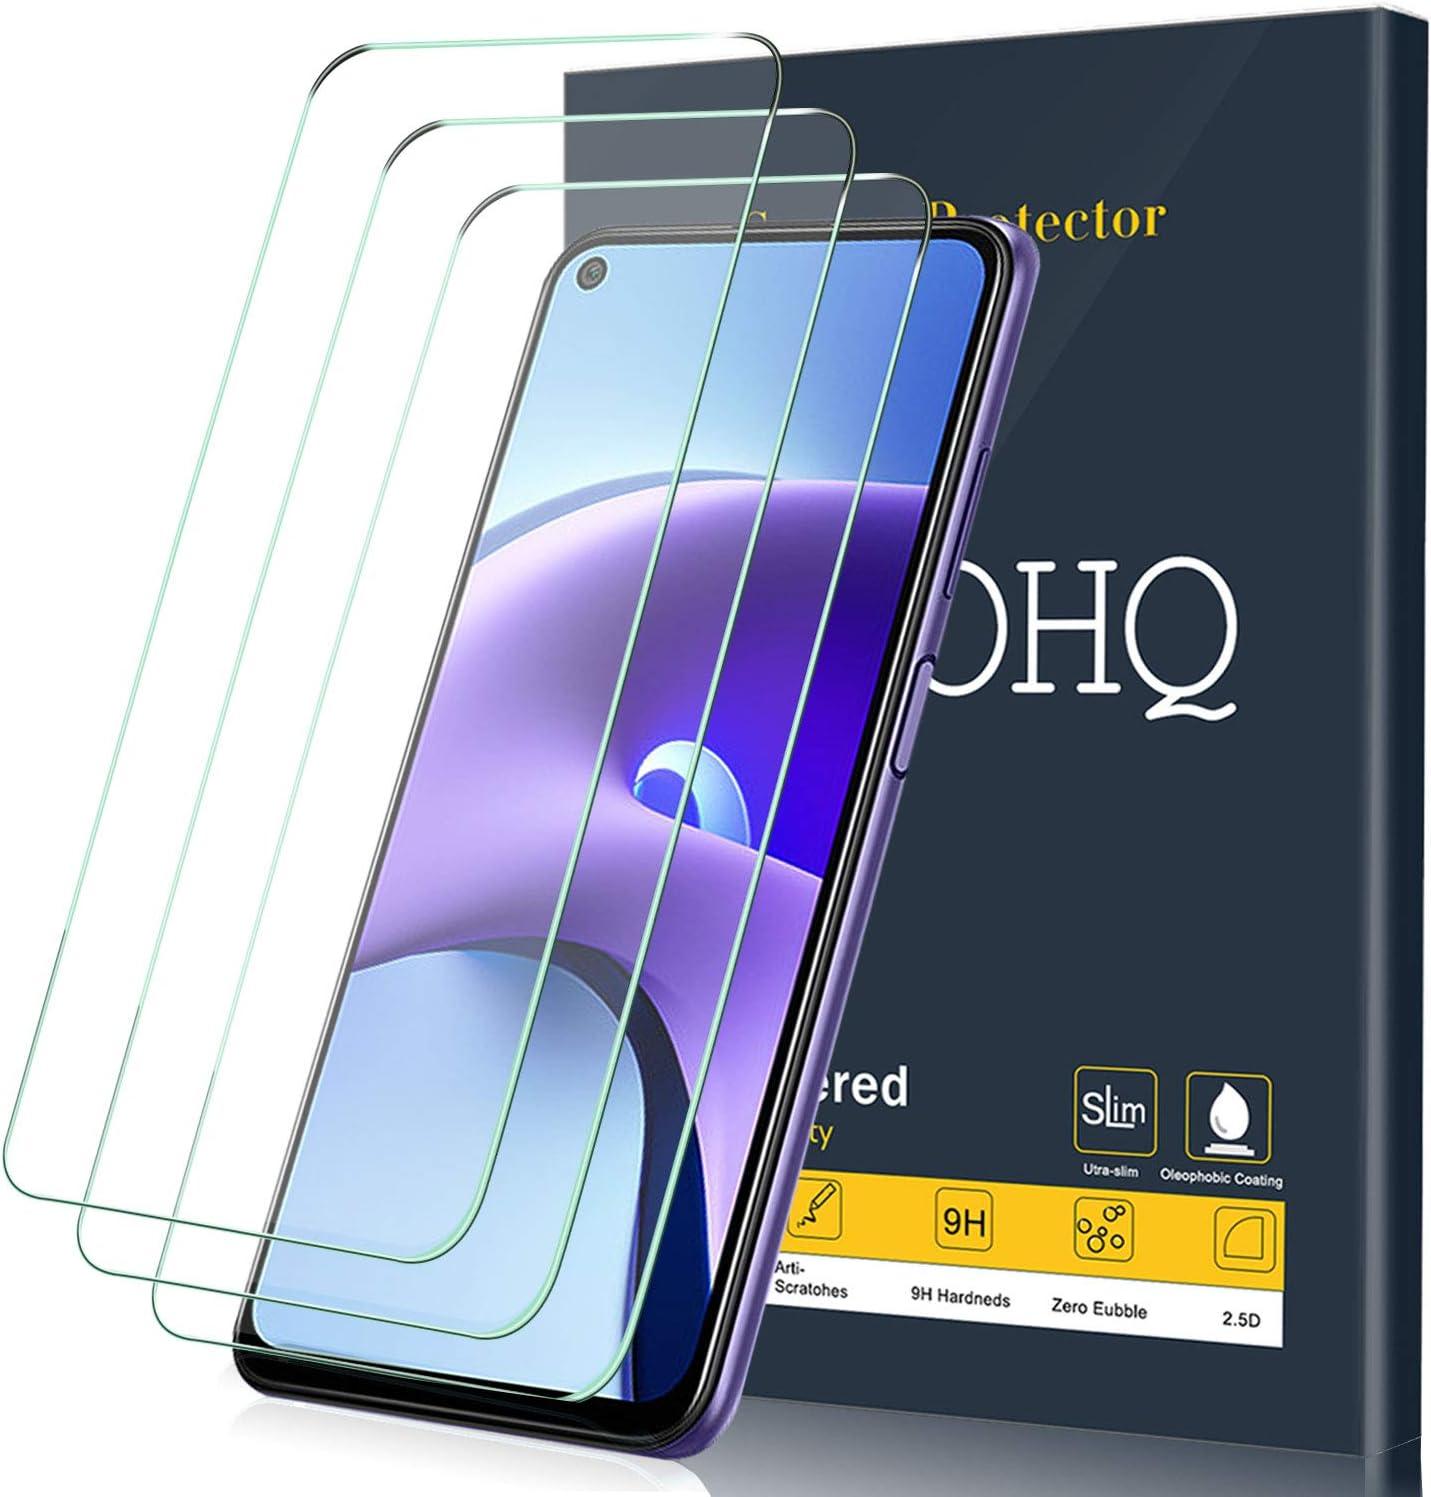 QHOHQ 3 Piezas Protector de Pantalla para Xiaomi Redmi Note 9T 5G, Cristal Templado Membrana,9H Dureza - HD - Anti-Arañazos - Sin Burbujas - Fácil de Instalar